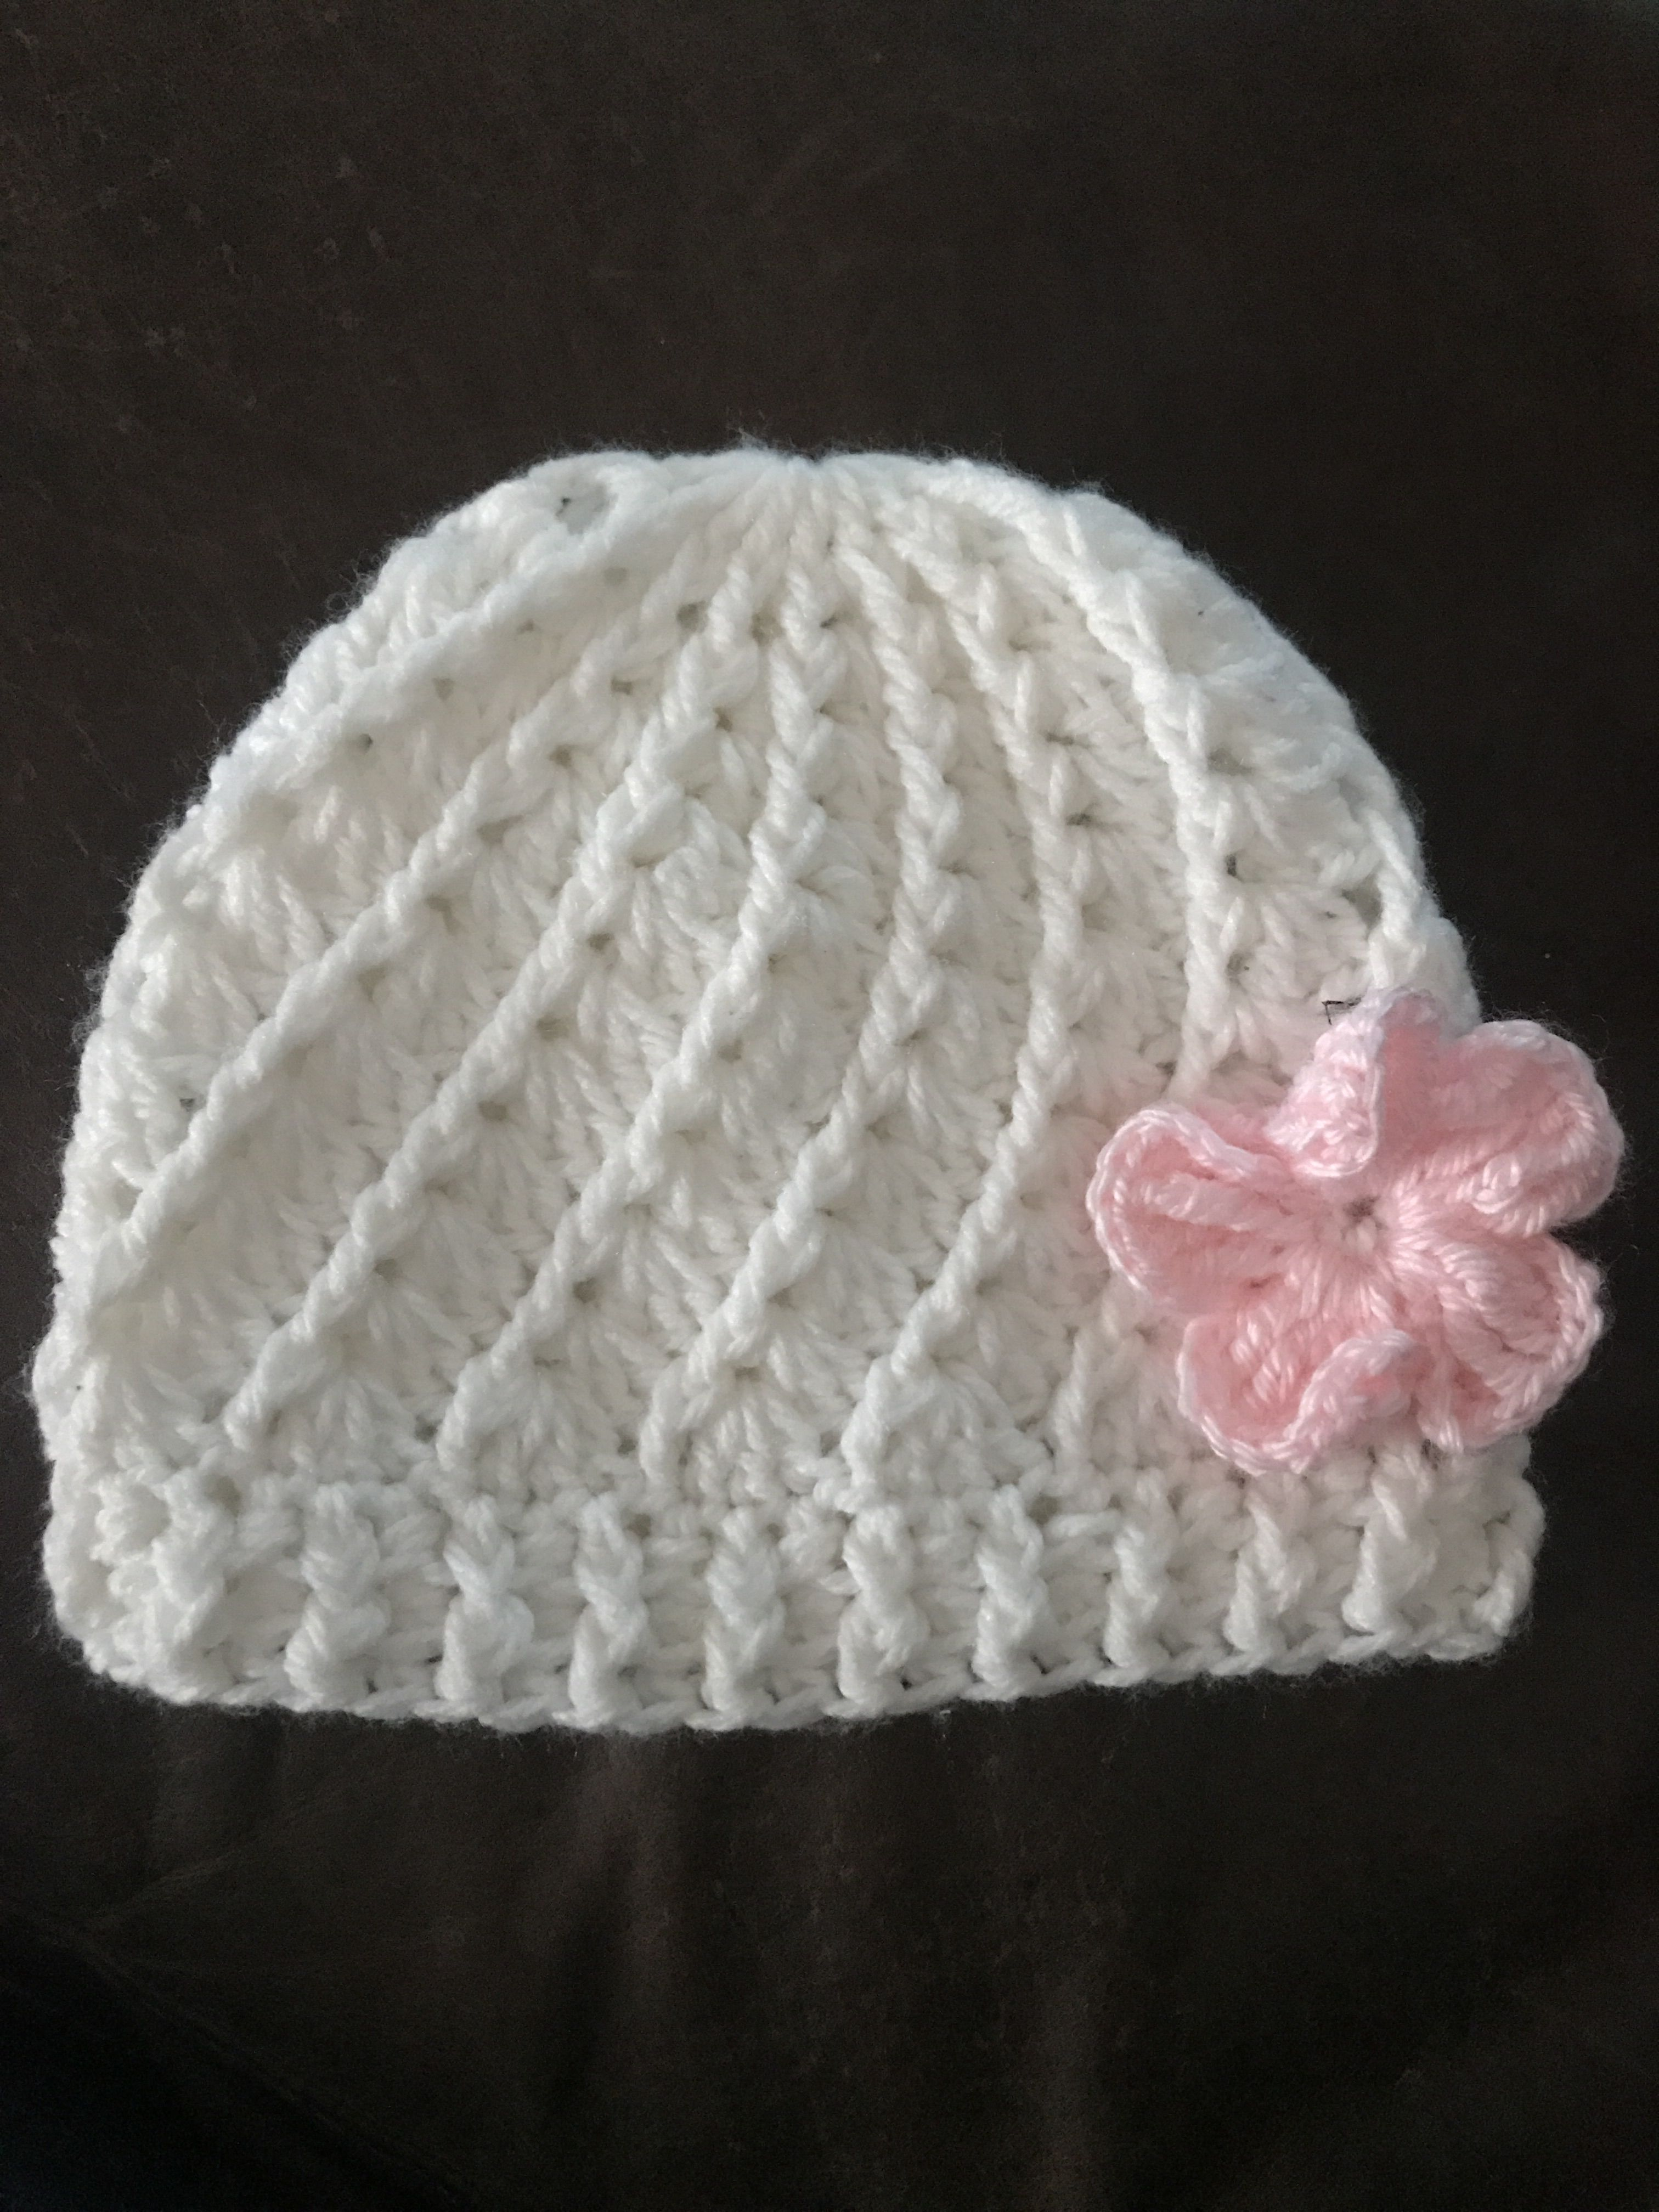 Pin by Rita Carlson on crochet babies and children | Pinterest ...